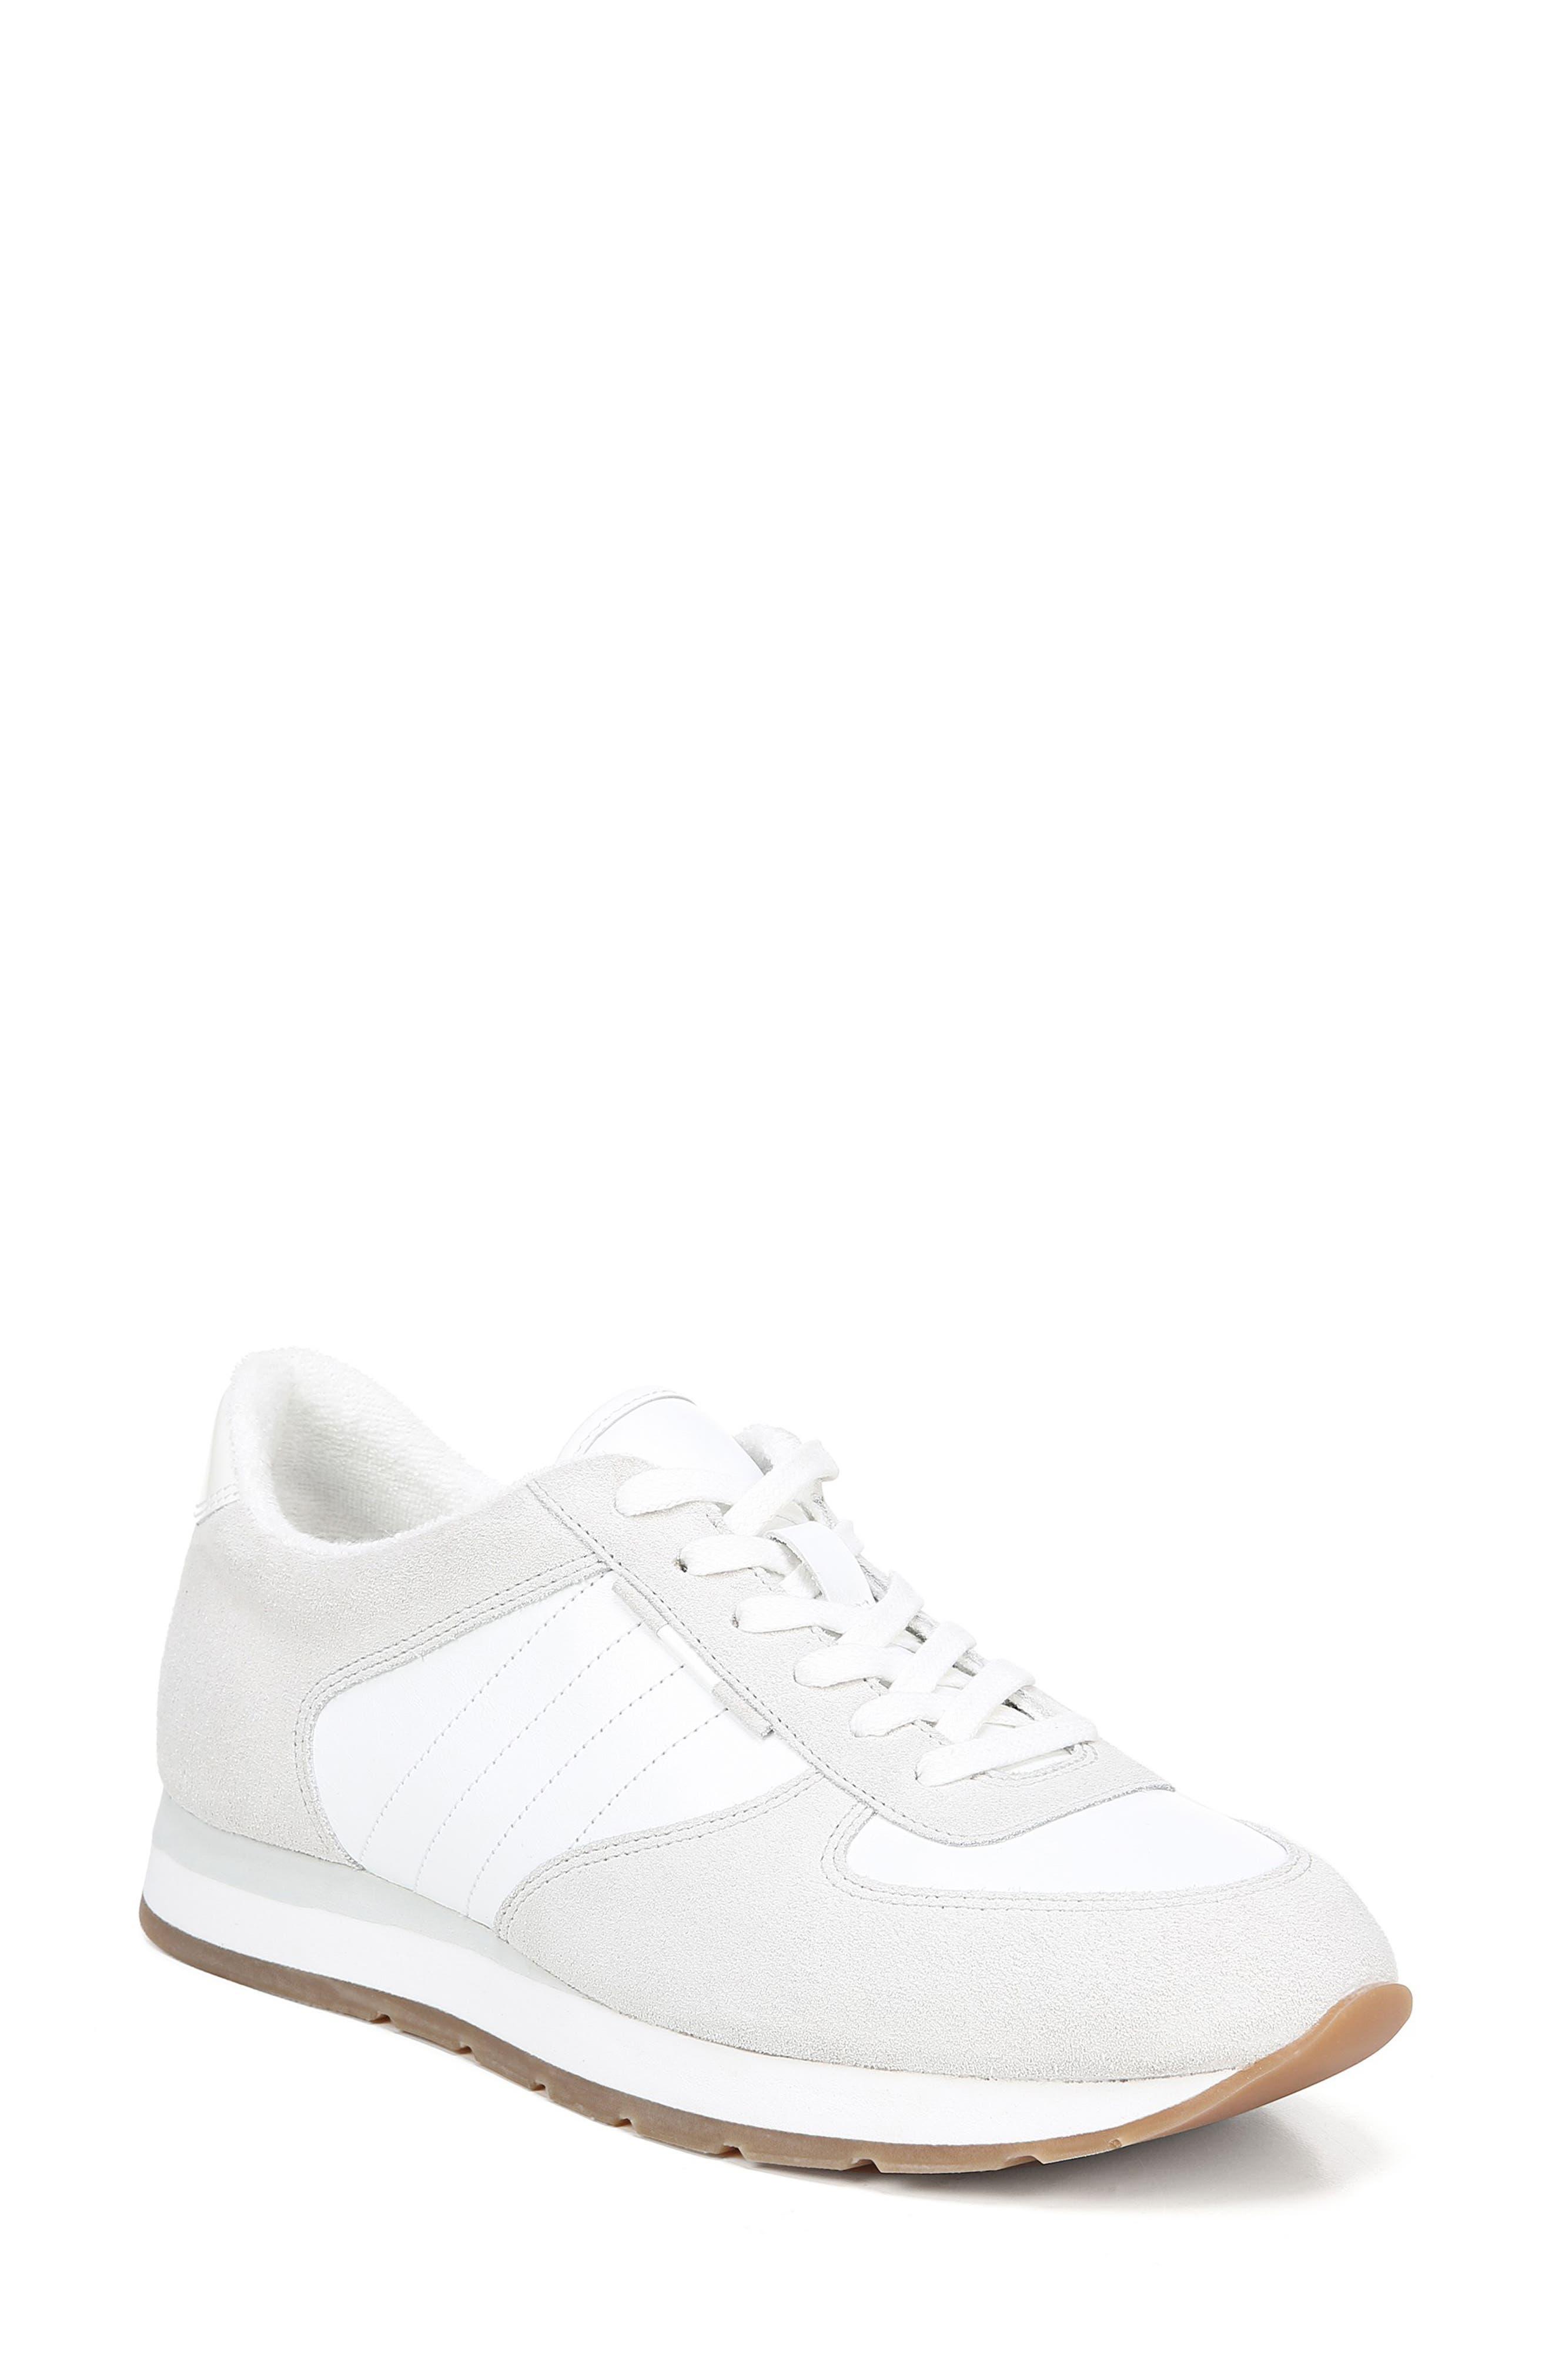 VINCE Pasha Sneaker, Main, color, WHITE